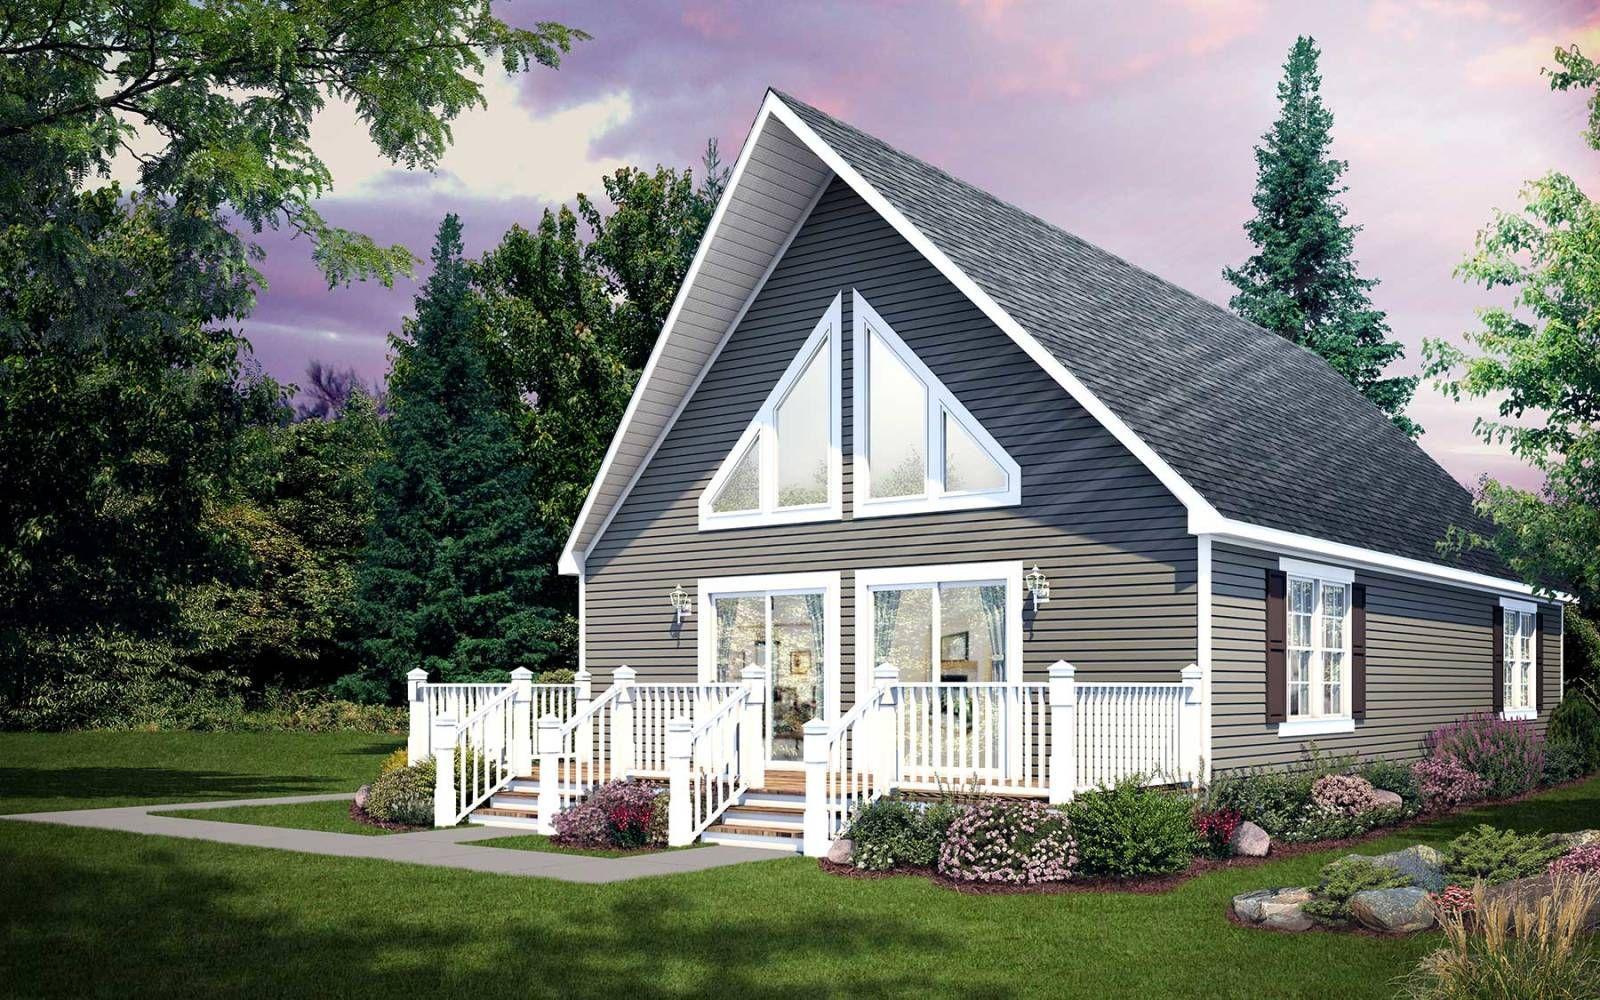 Eden Chalet All American Homes All American Homes House Plans Chalet Custom Modular Homes